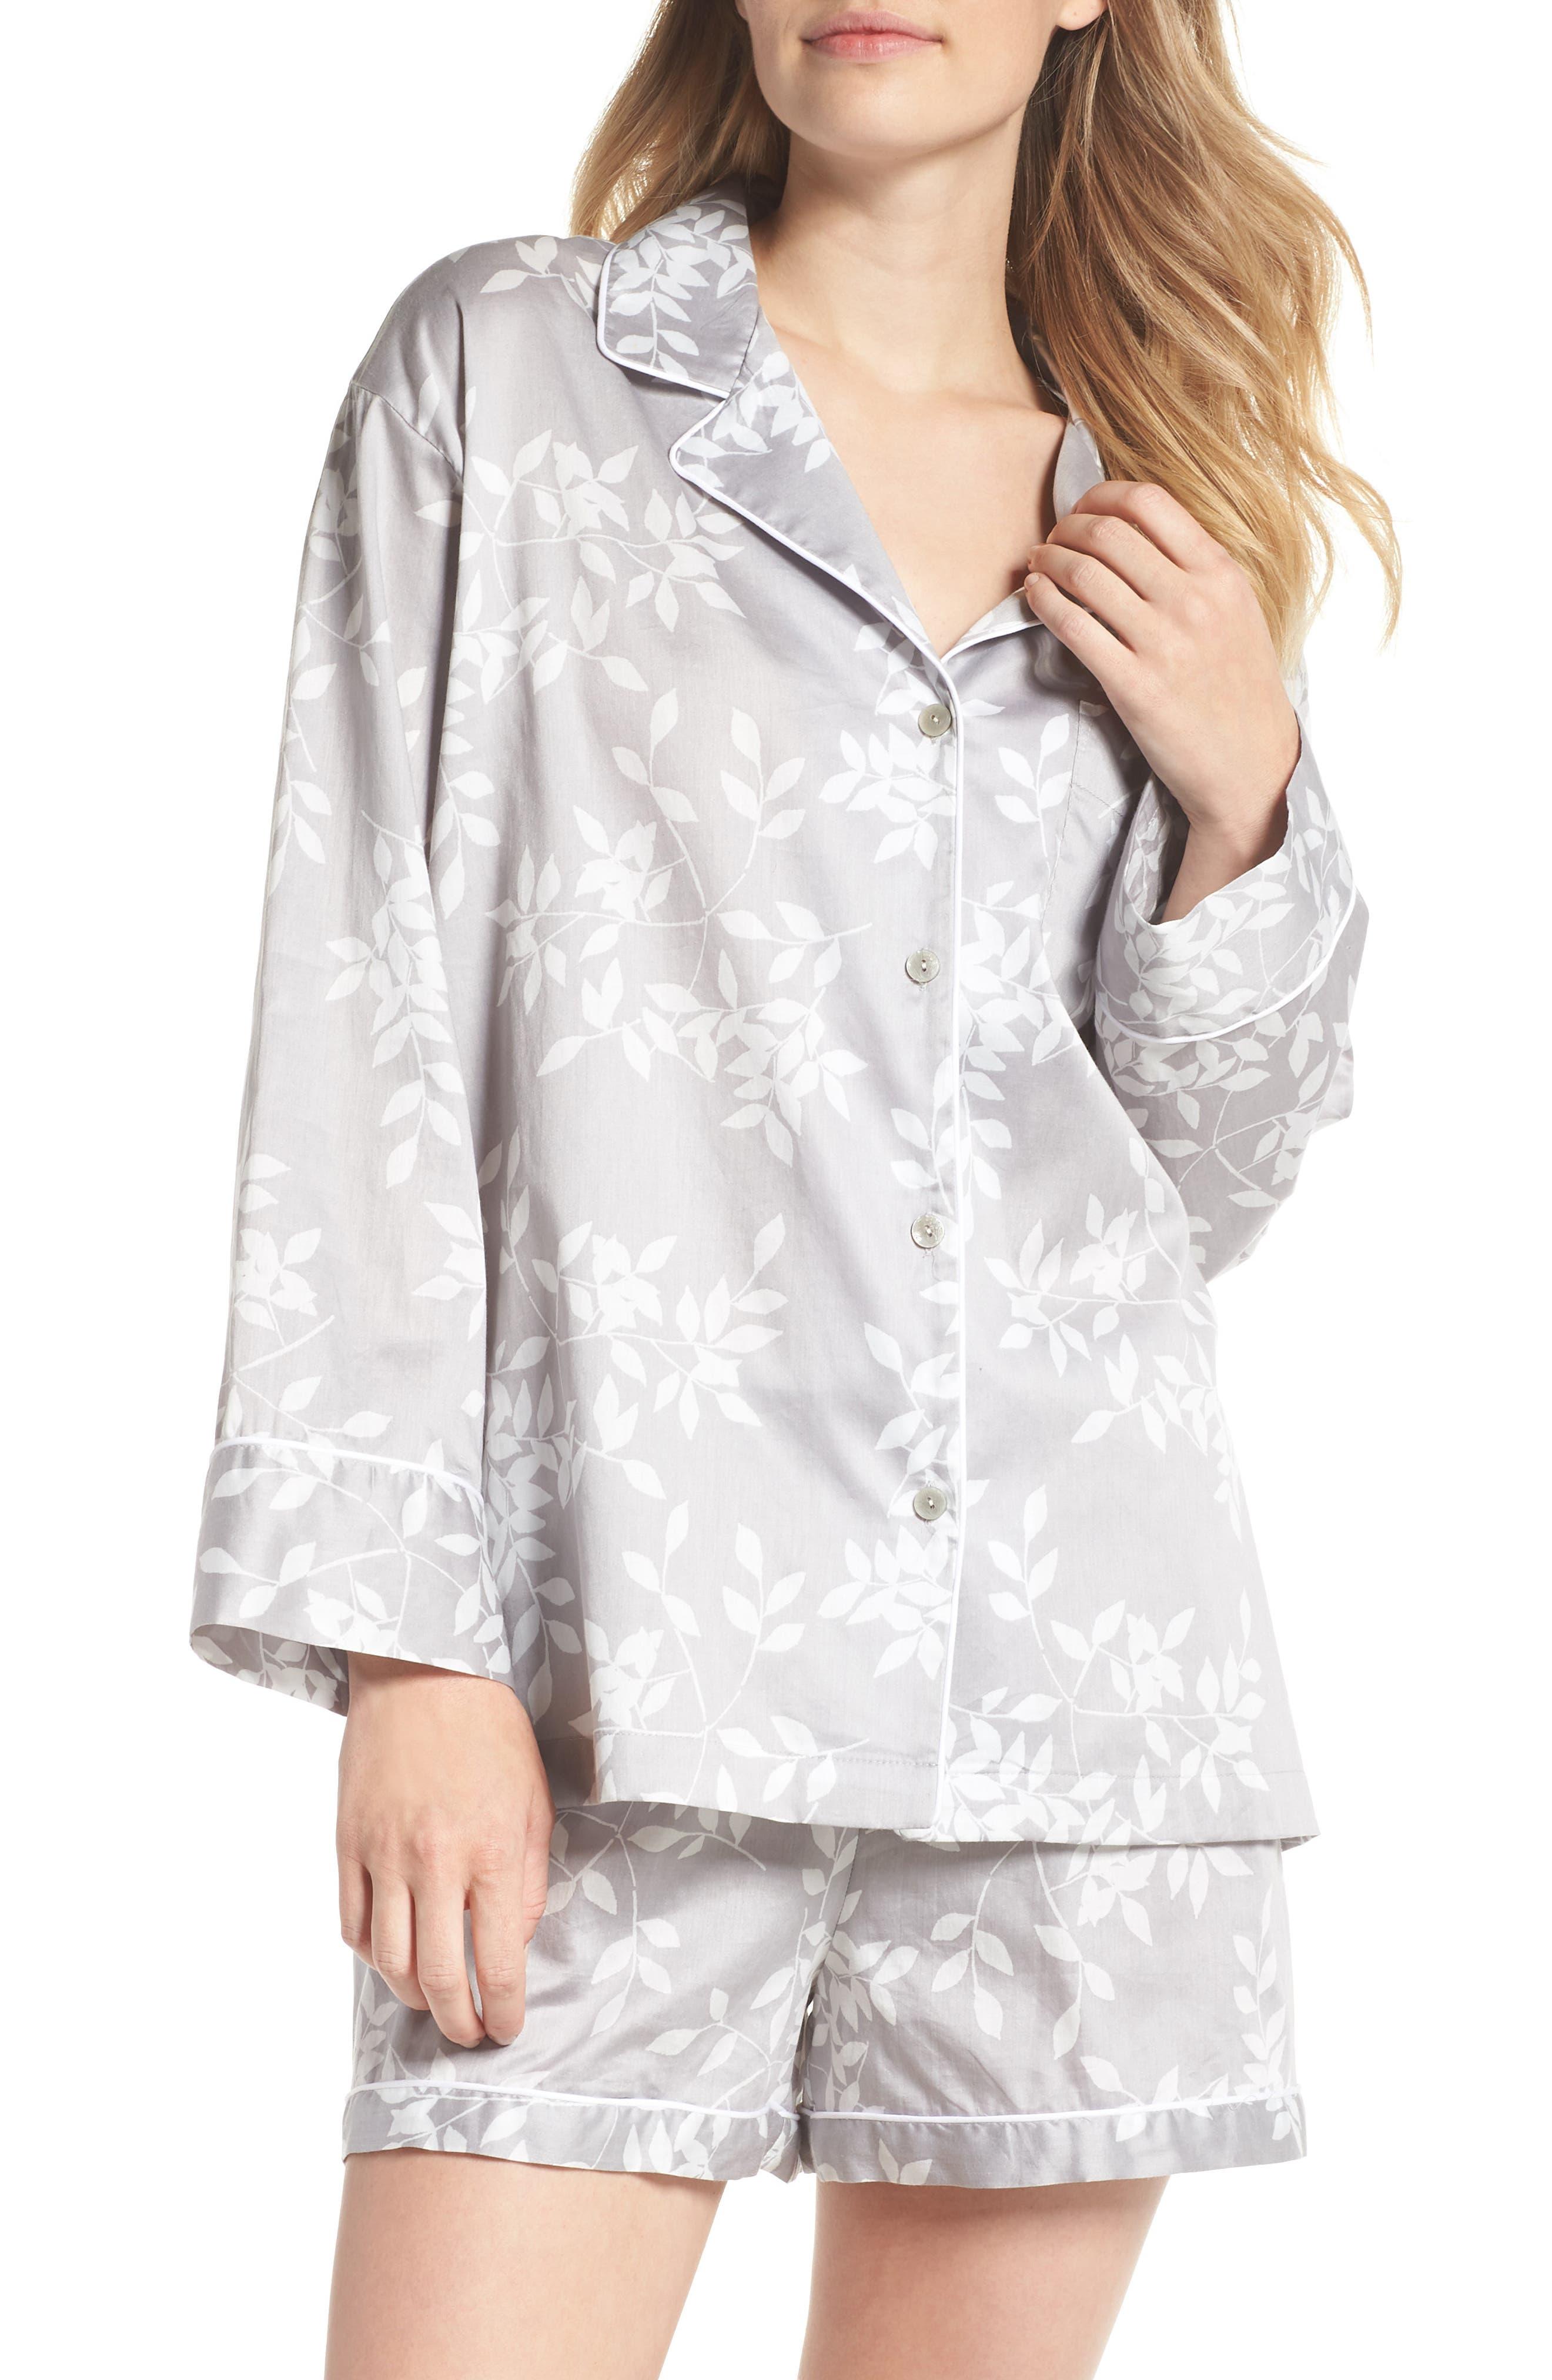 Branch Print Cotton Sateen Short Pajamas,                         Main,                         color, 021